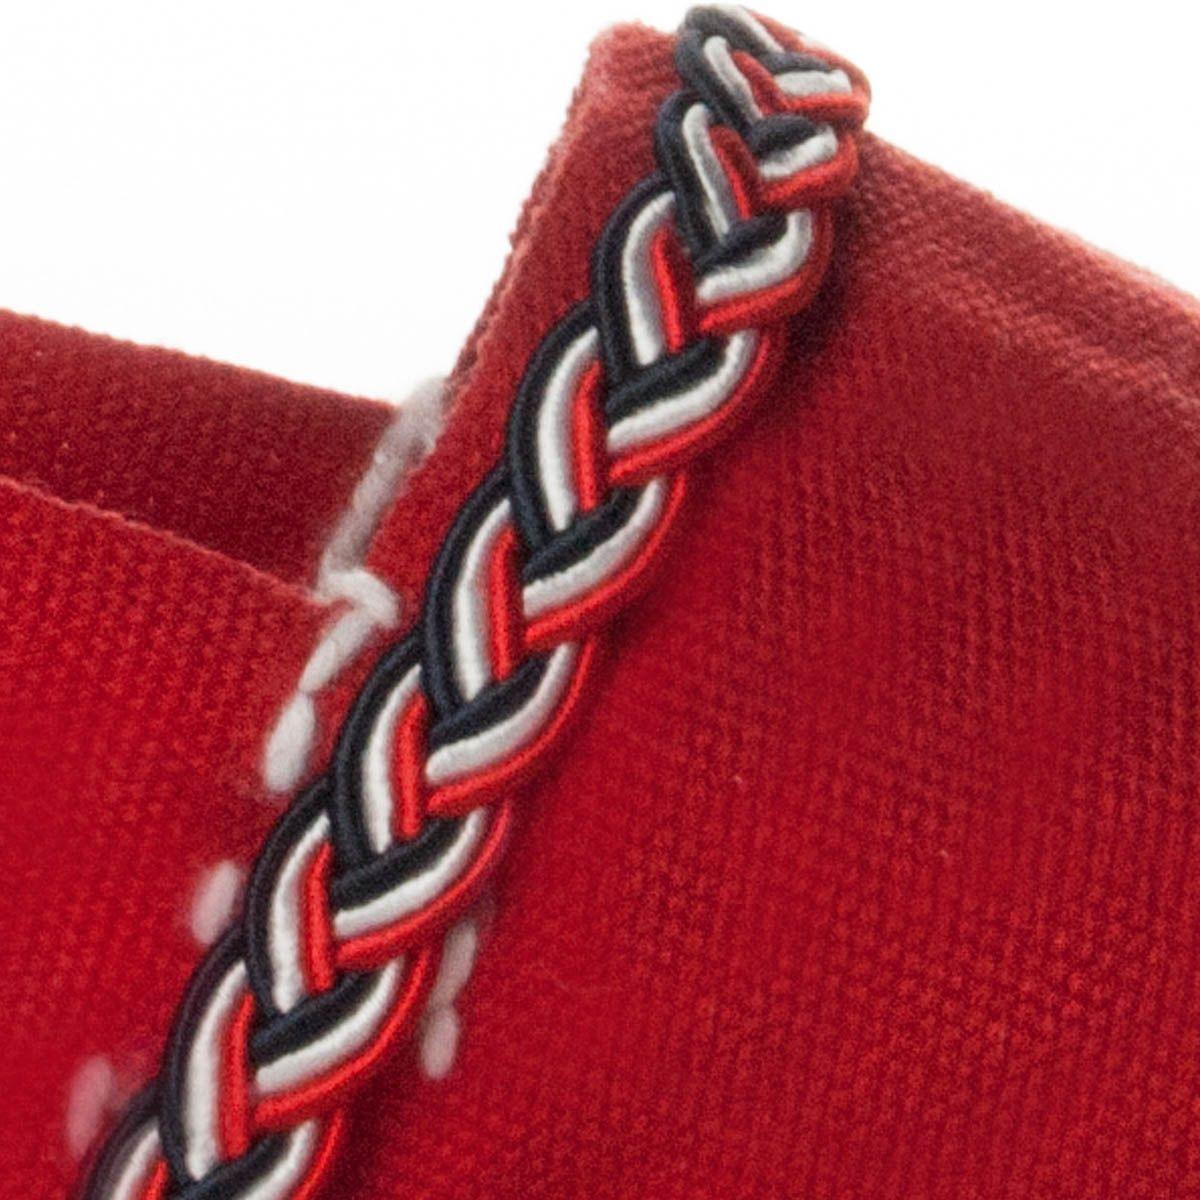 Maria Graor Artisanal Espadrille in Red